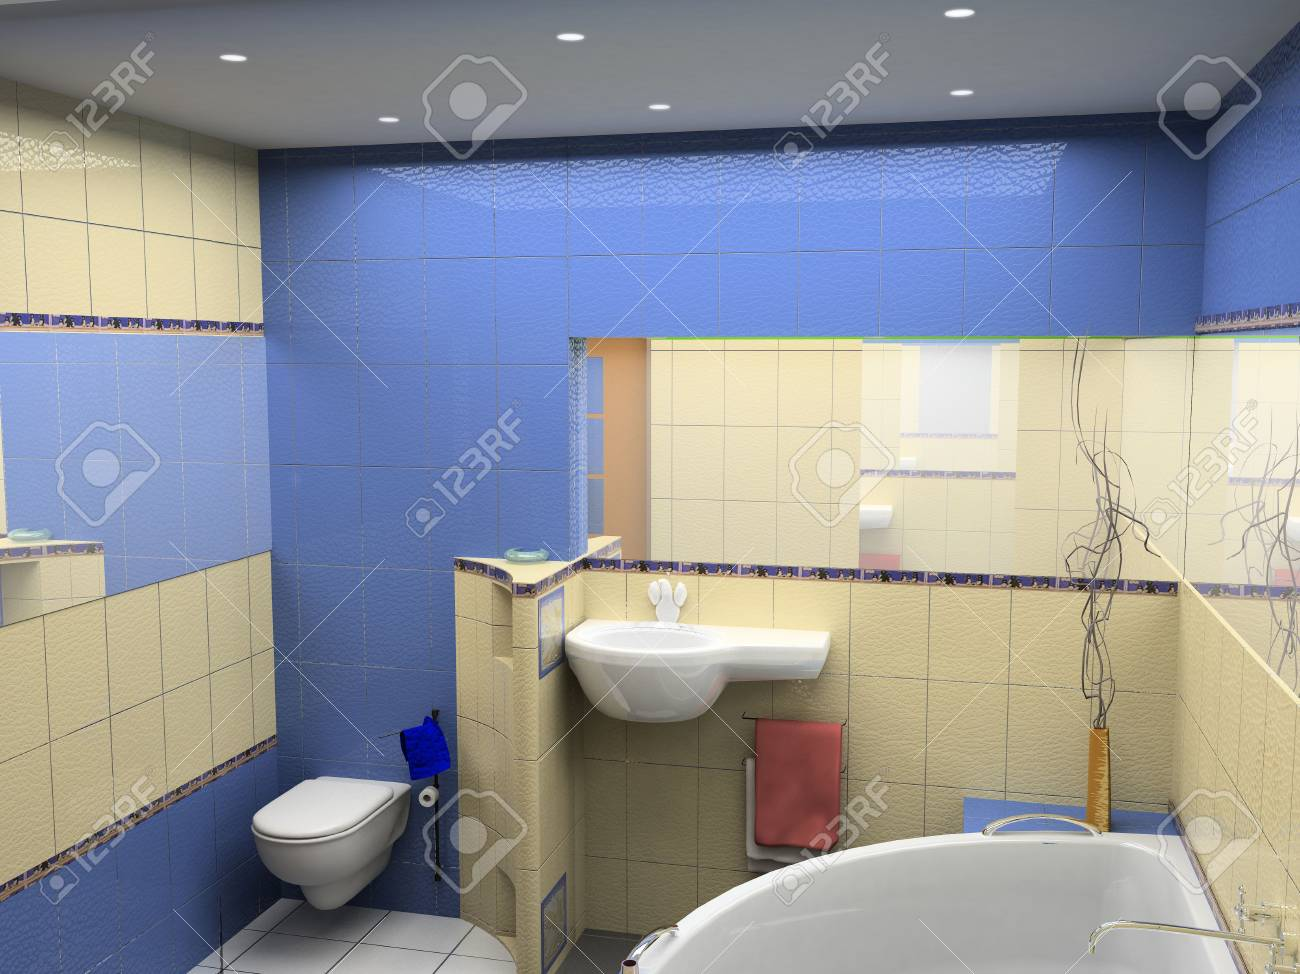 design of the modrn bath room interior (3D) Stock Photo - 608331